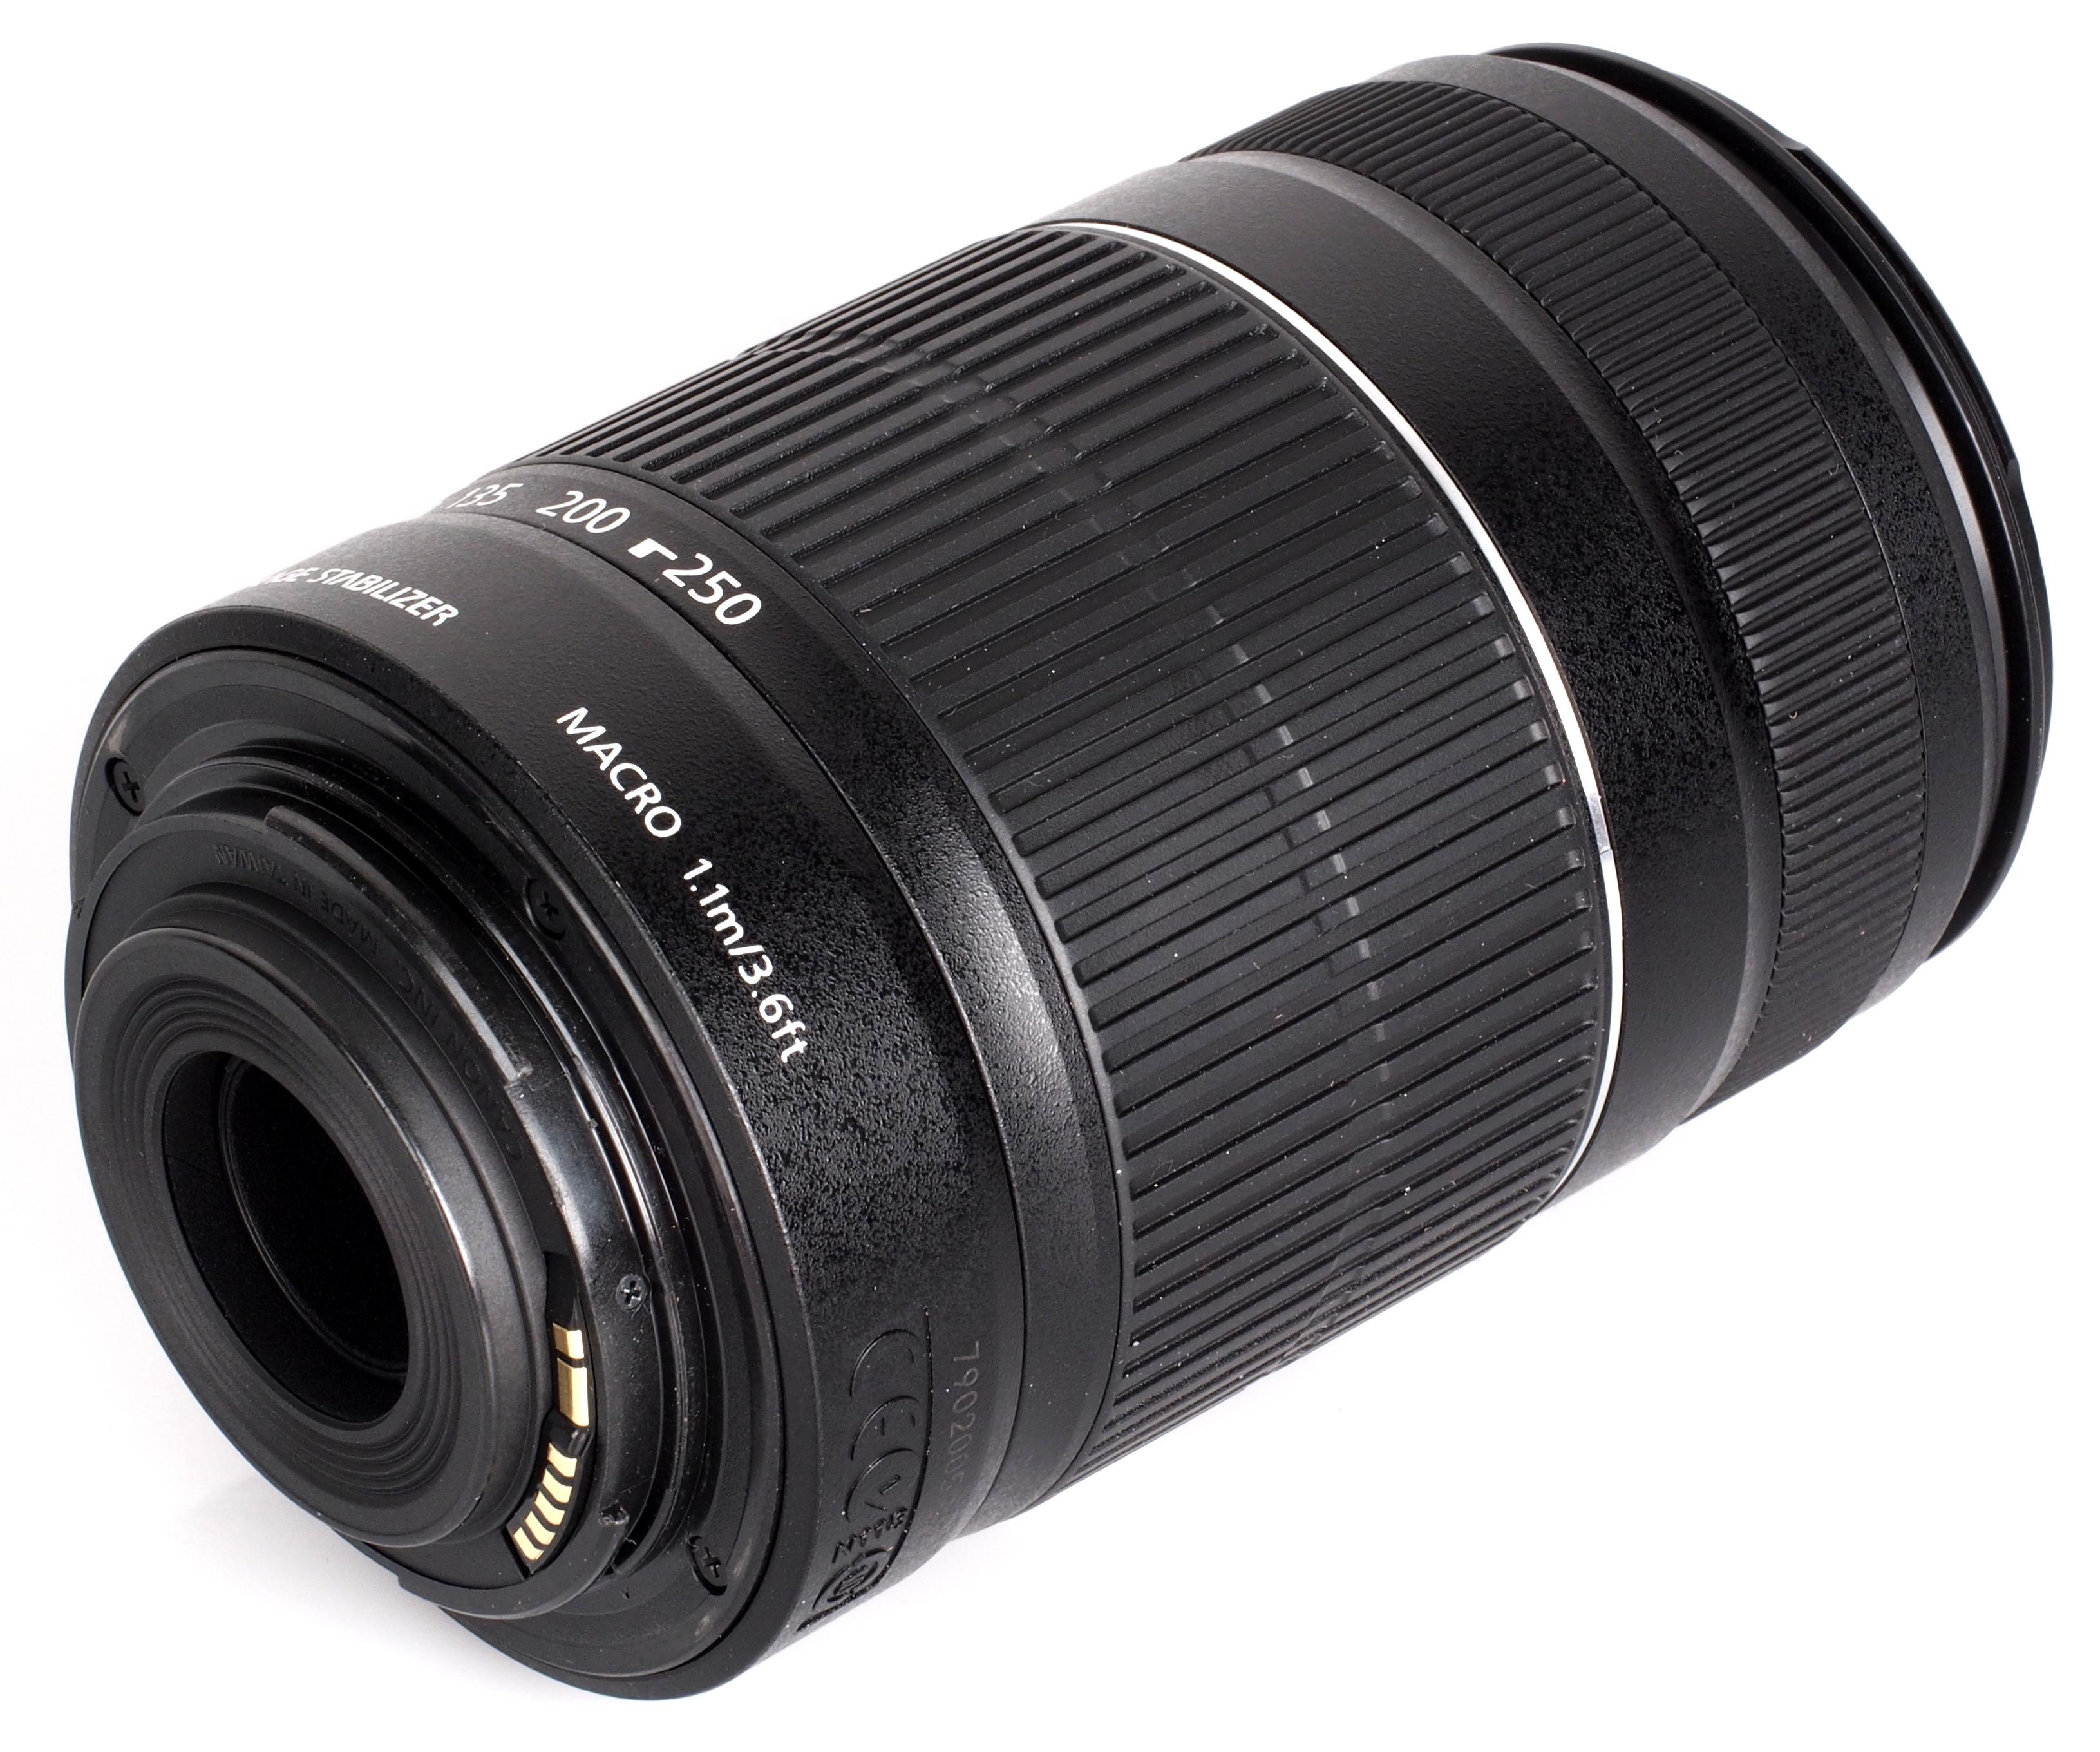 canon ef s 55 250mm f 4 5 6 is ii lens review. Black Bedroom Furniture Sets. Home Design Ideas